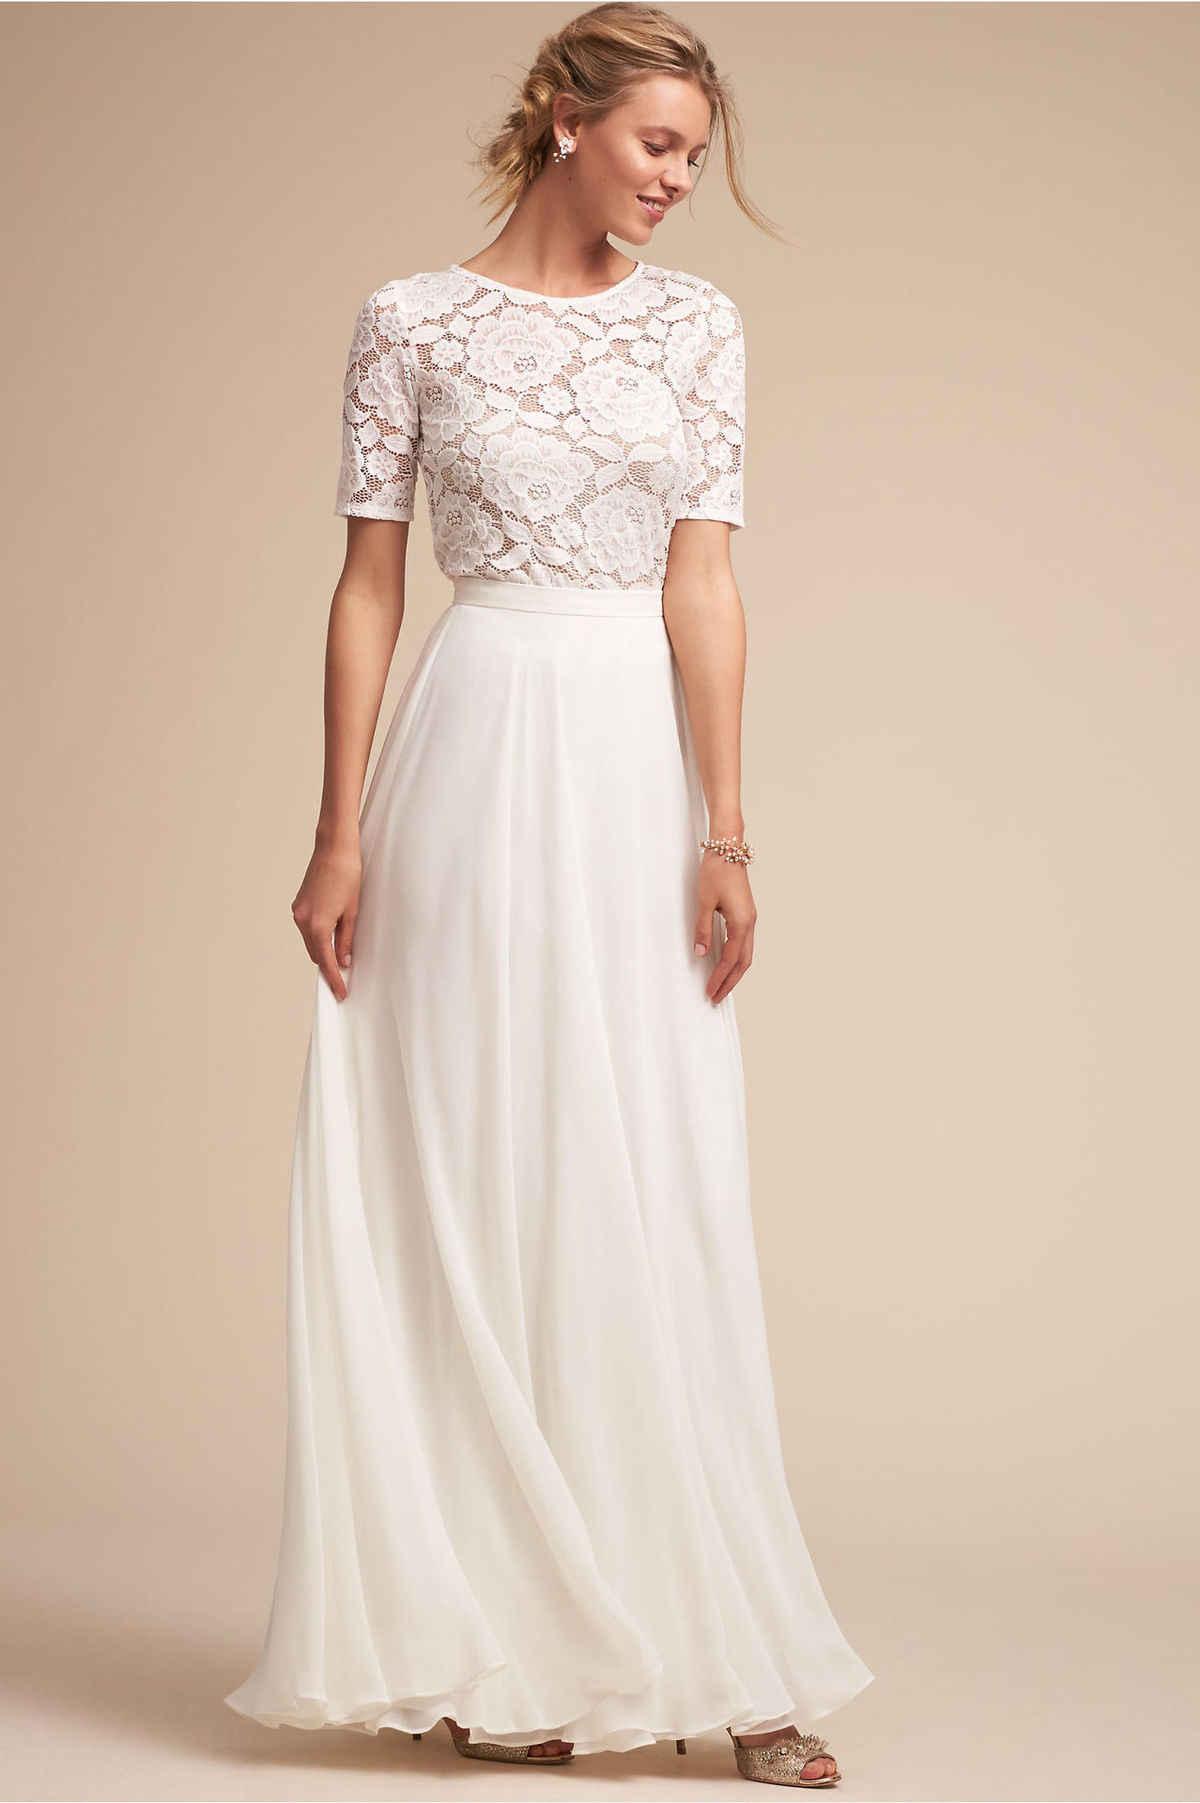 Backlakegirls Elegant Evening Dress White Lace Short Sleeve Appliques  Choffon 2018 Hot Sale For Party Women 3488f2421c16